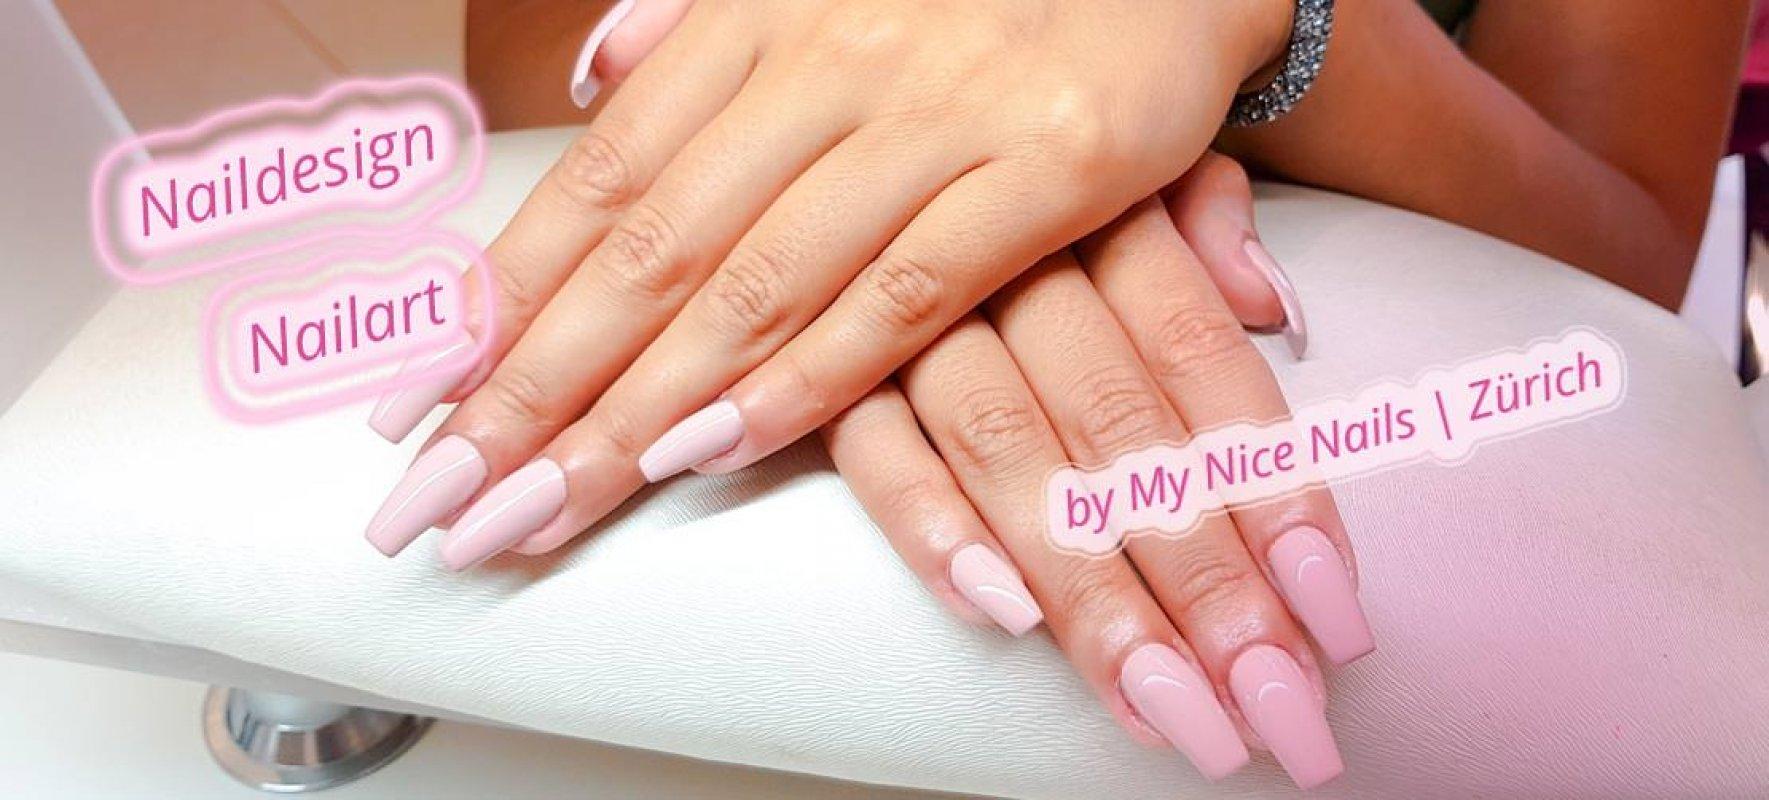 my nice nails 100 nails perfektion freundlichkeit. Black Bedroom Furniture Sets. Home Design Ideas